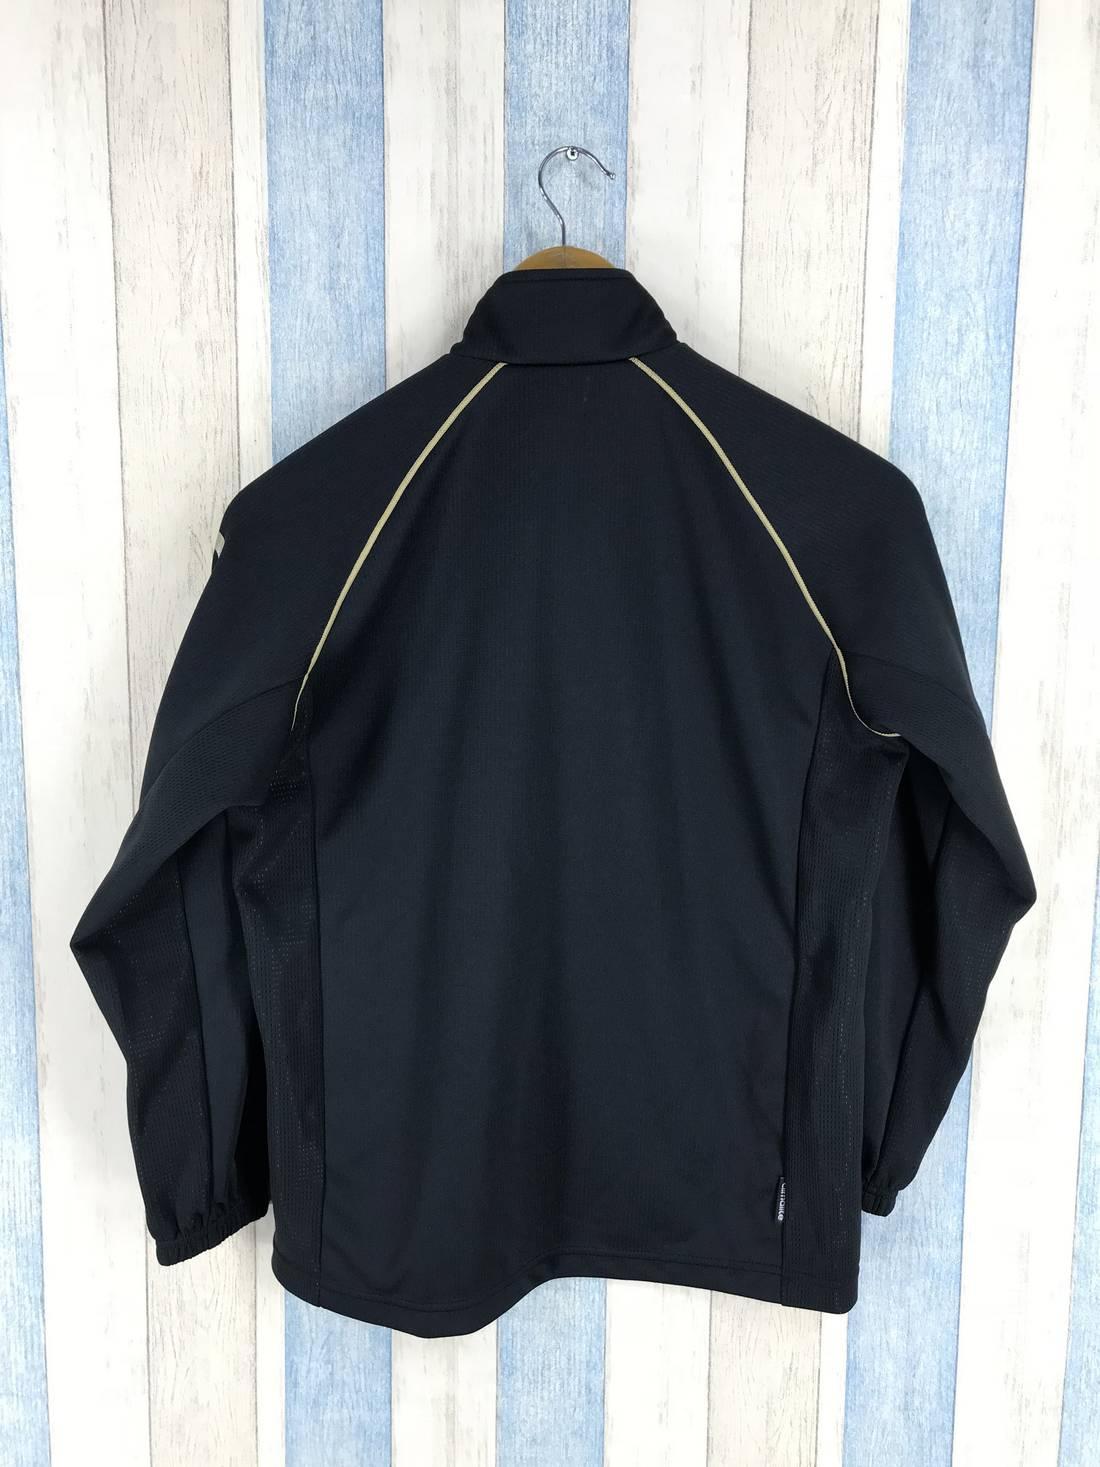 Adidas Vintage 90s ADIDAS Track Top Vintage ADIDAS Jacket Top Zipper Small Adidas Three 283c329 - grind.website